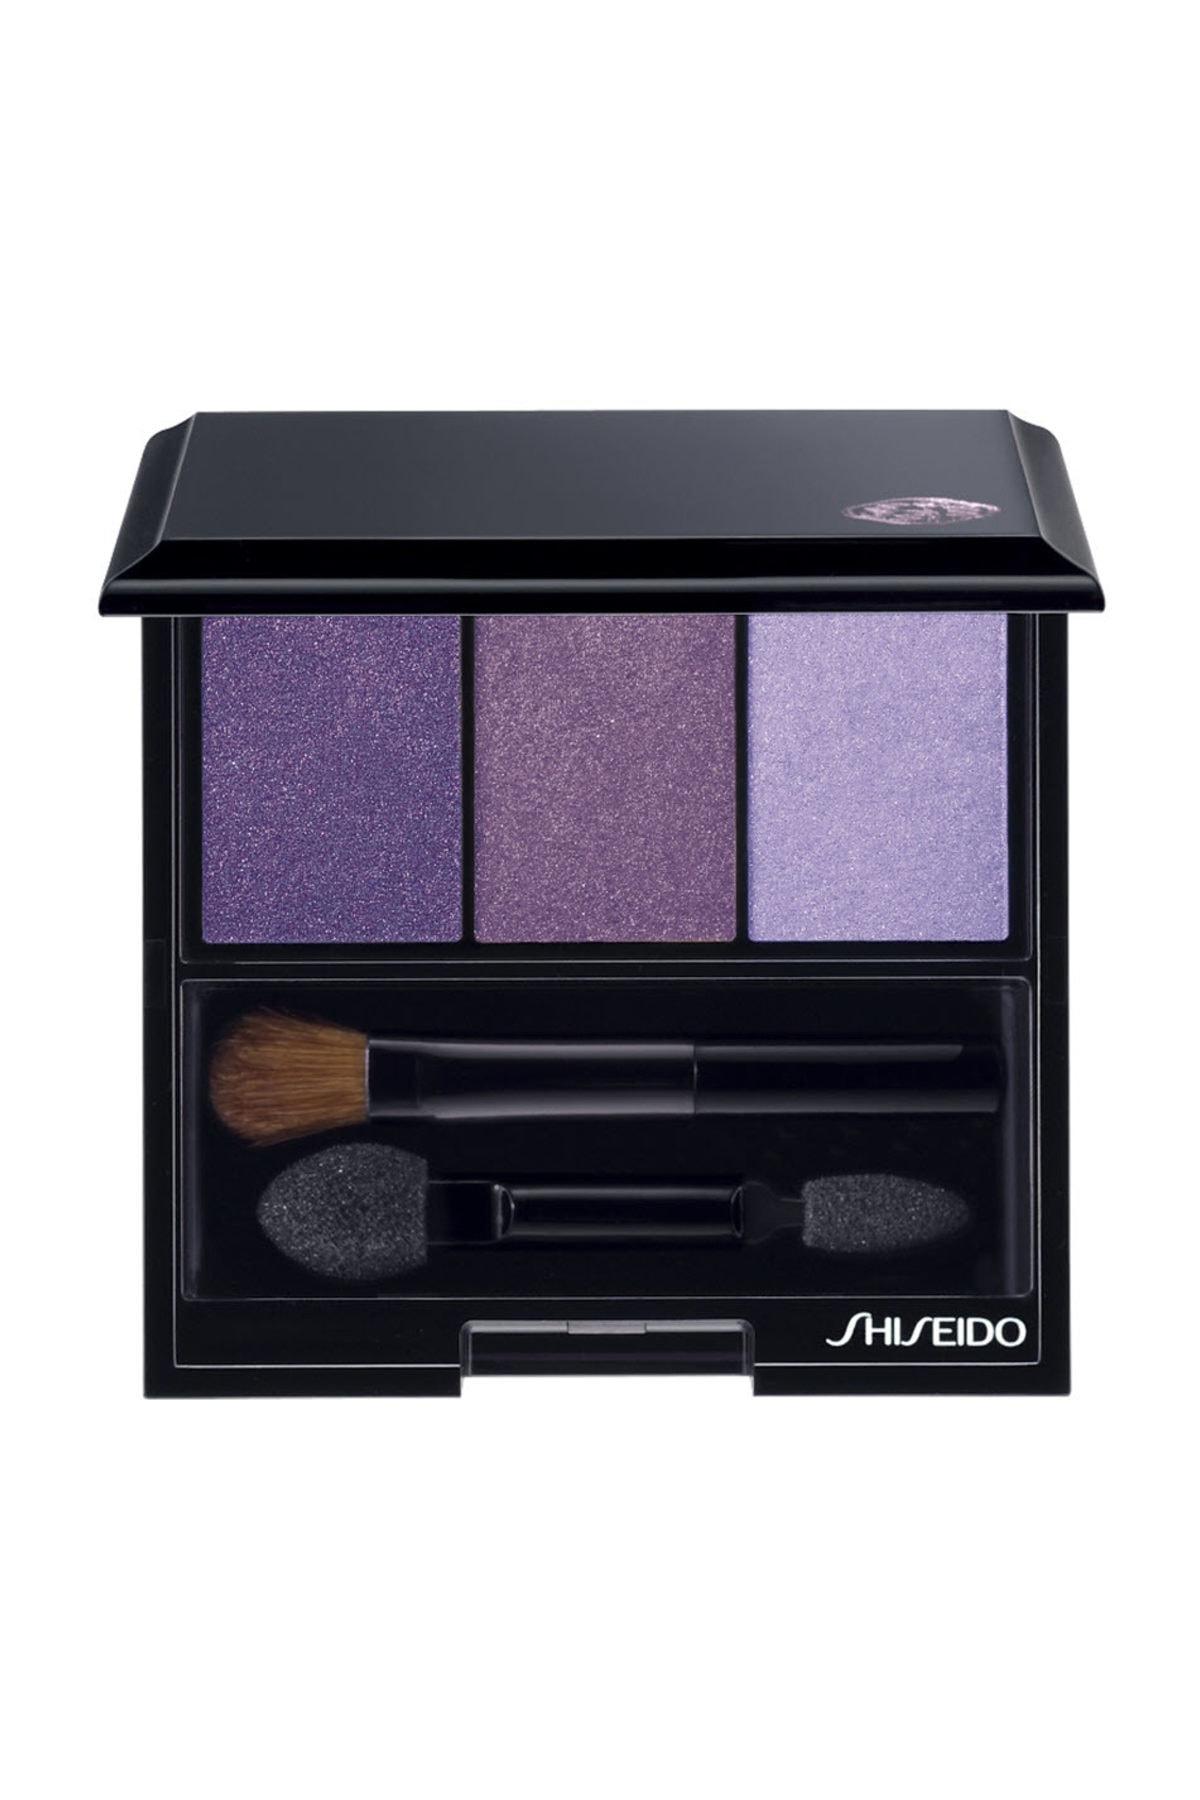 Shiseido Saten bitişli 3'lü Göz Farı - Luminizing Satin Eye Color Trio VI308 729238107366 1